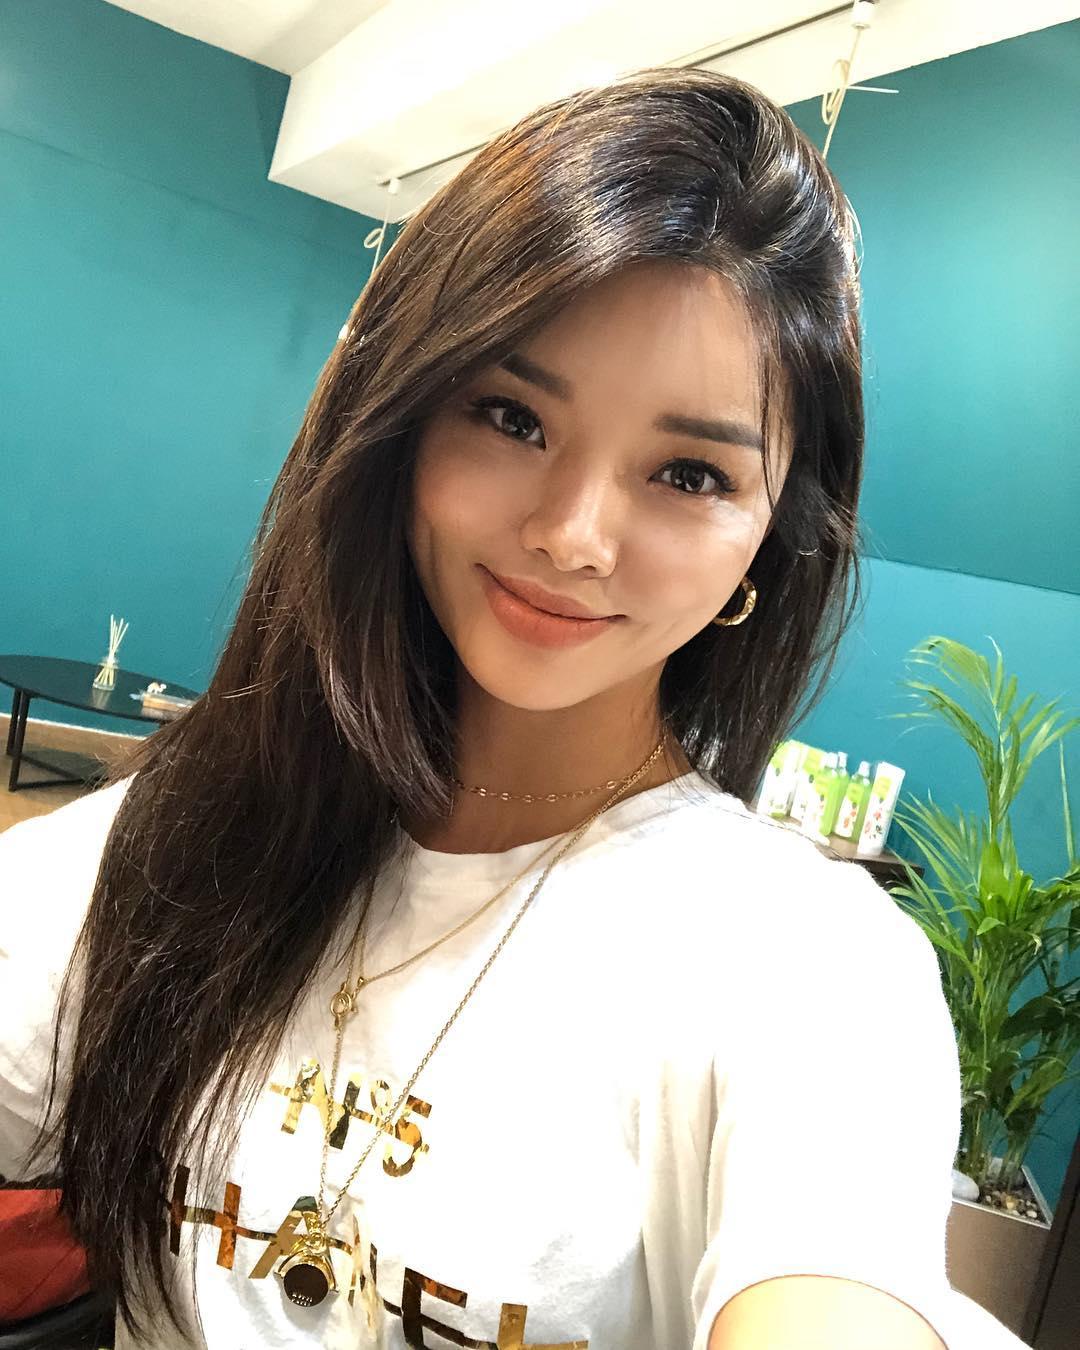 Hyemi beautiful South Korean model with perfect skin